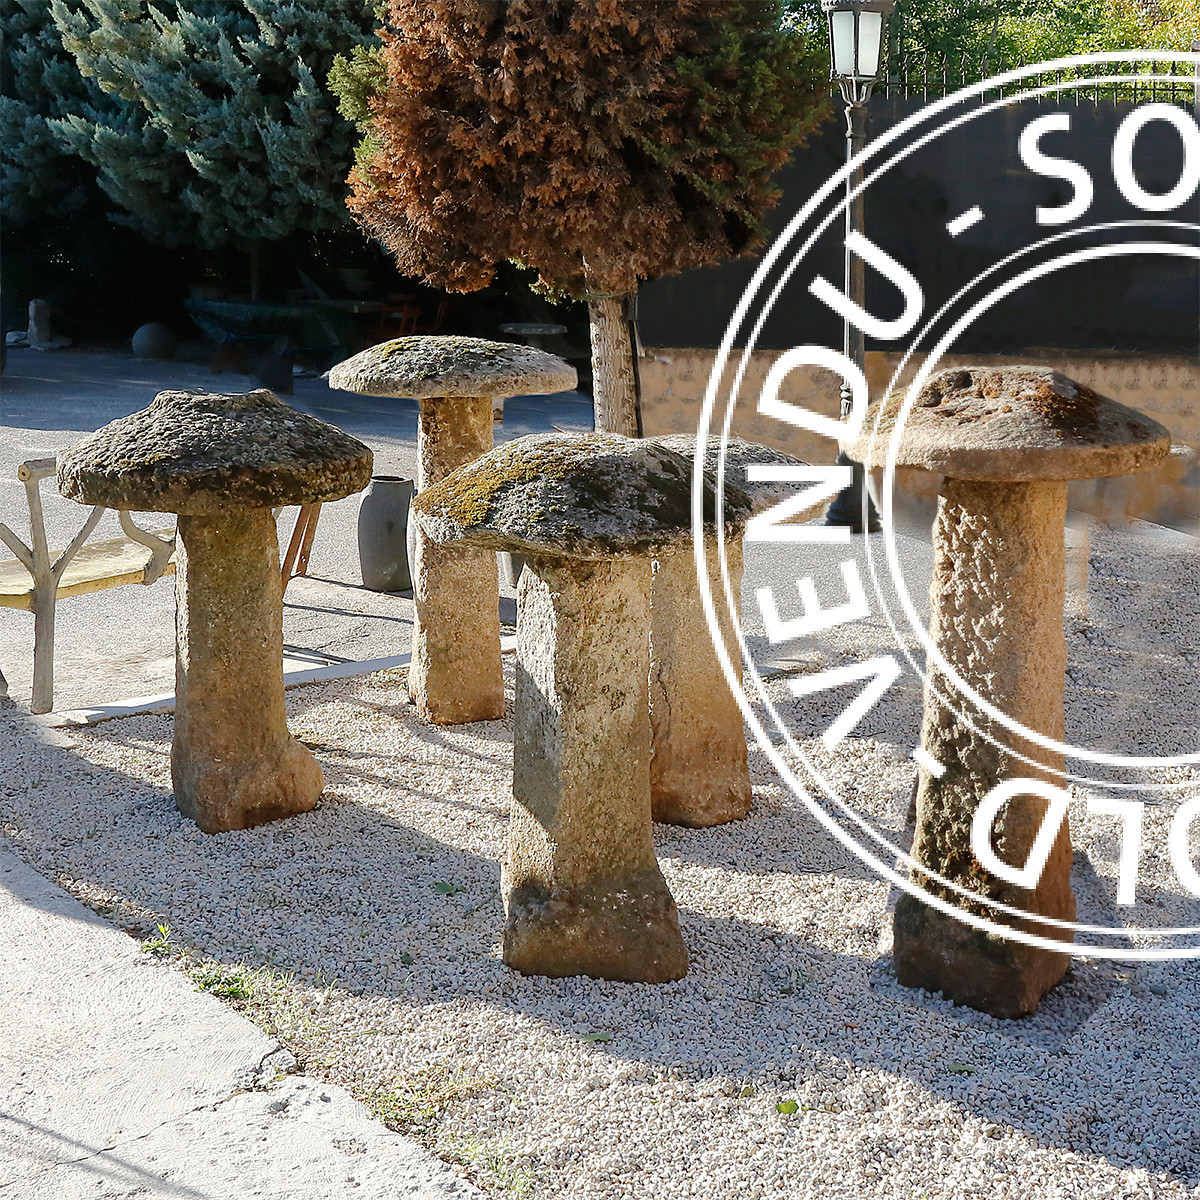 Sold - Decorative Garden Mushrooms In Granite 18Th Century ... intérieur Objet Decoration Jardin